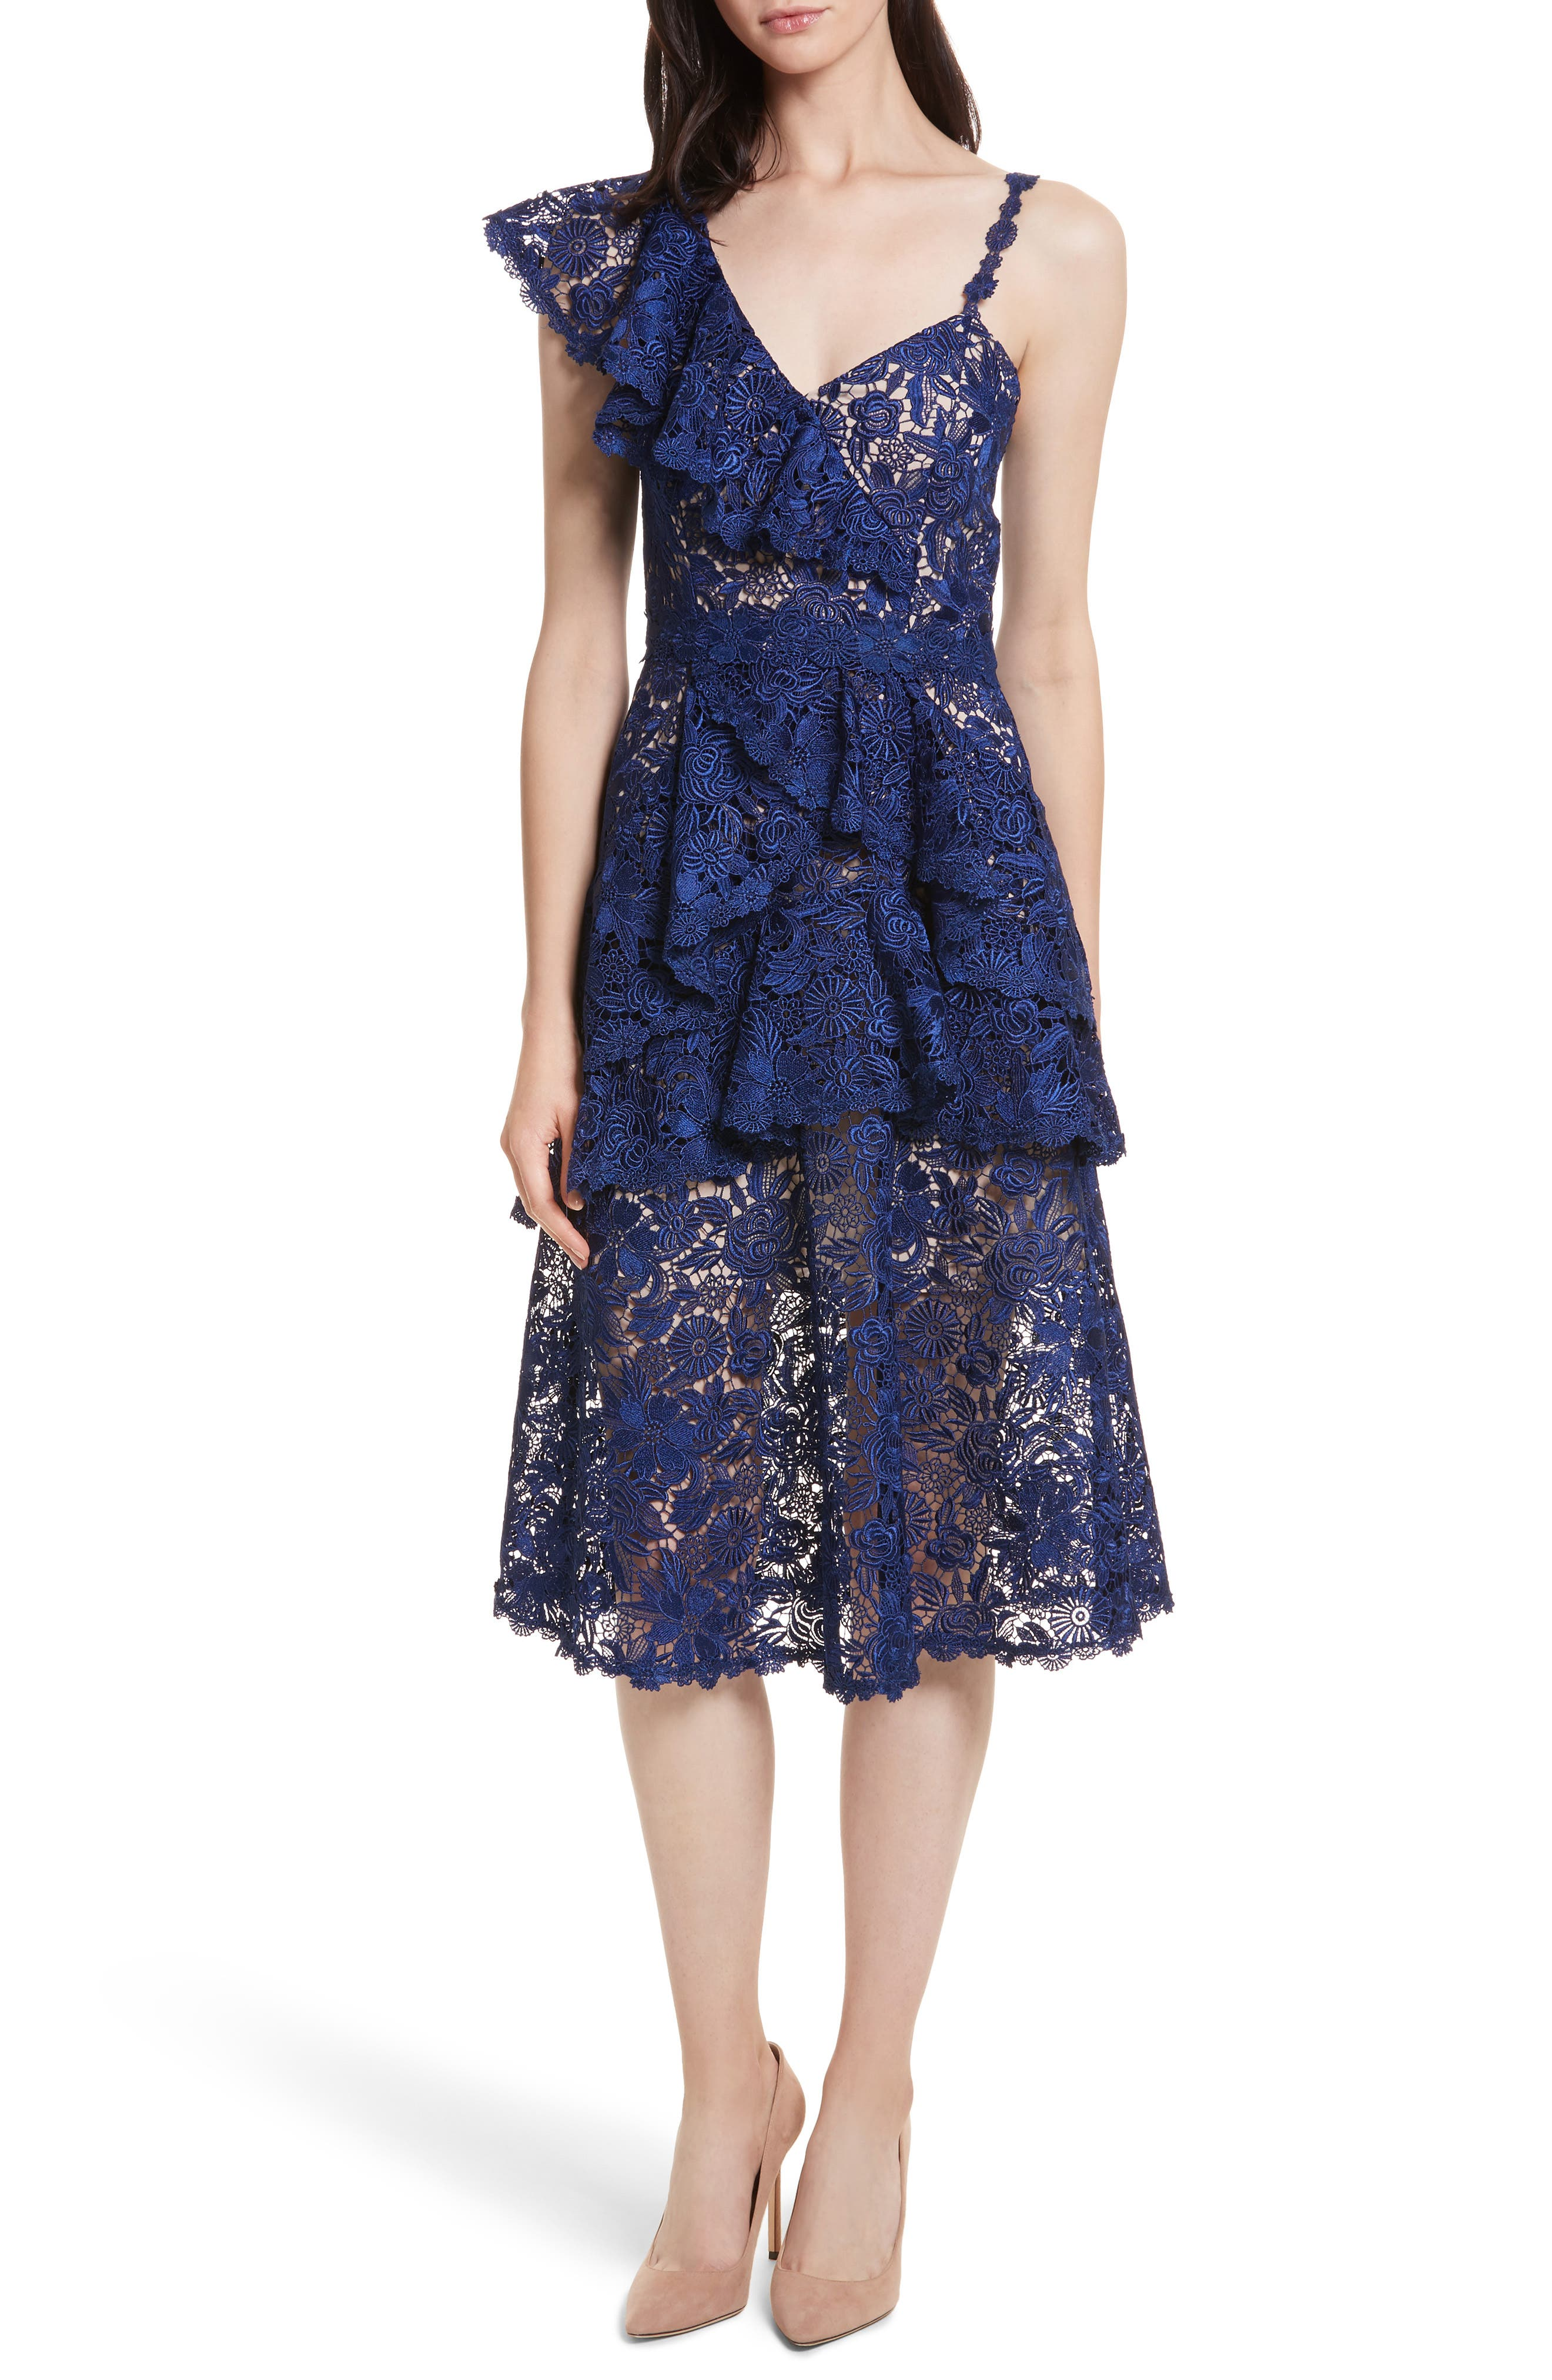 Alternate Image 1 Selected - Alice + Olivia Florrie Ruffled Lace Midi Dress